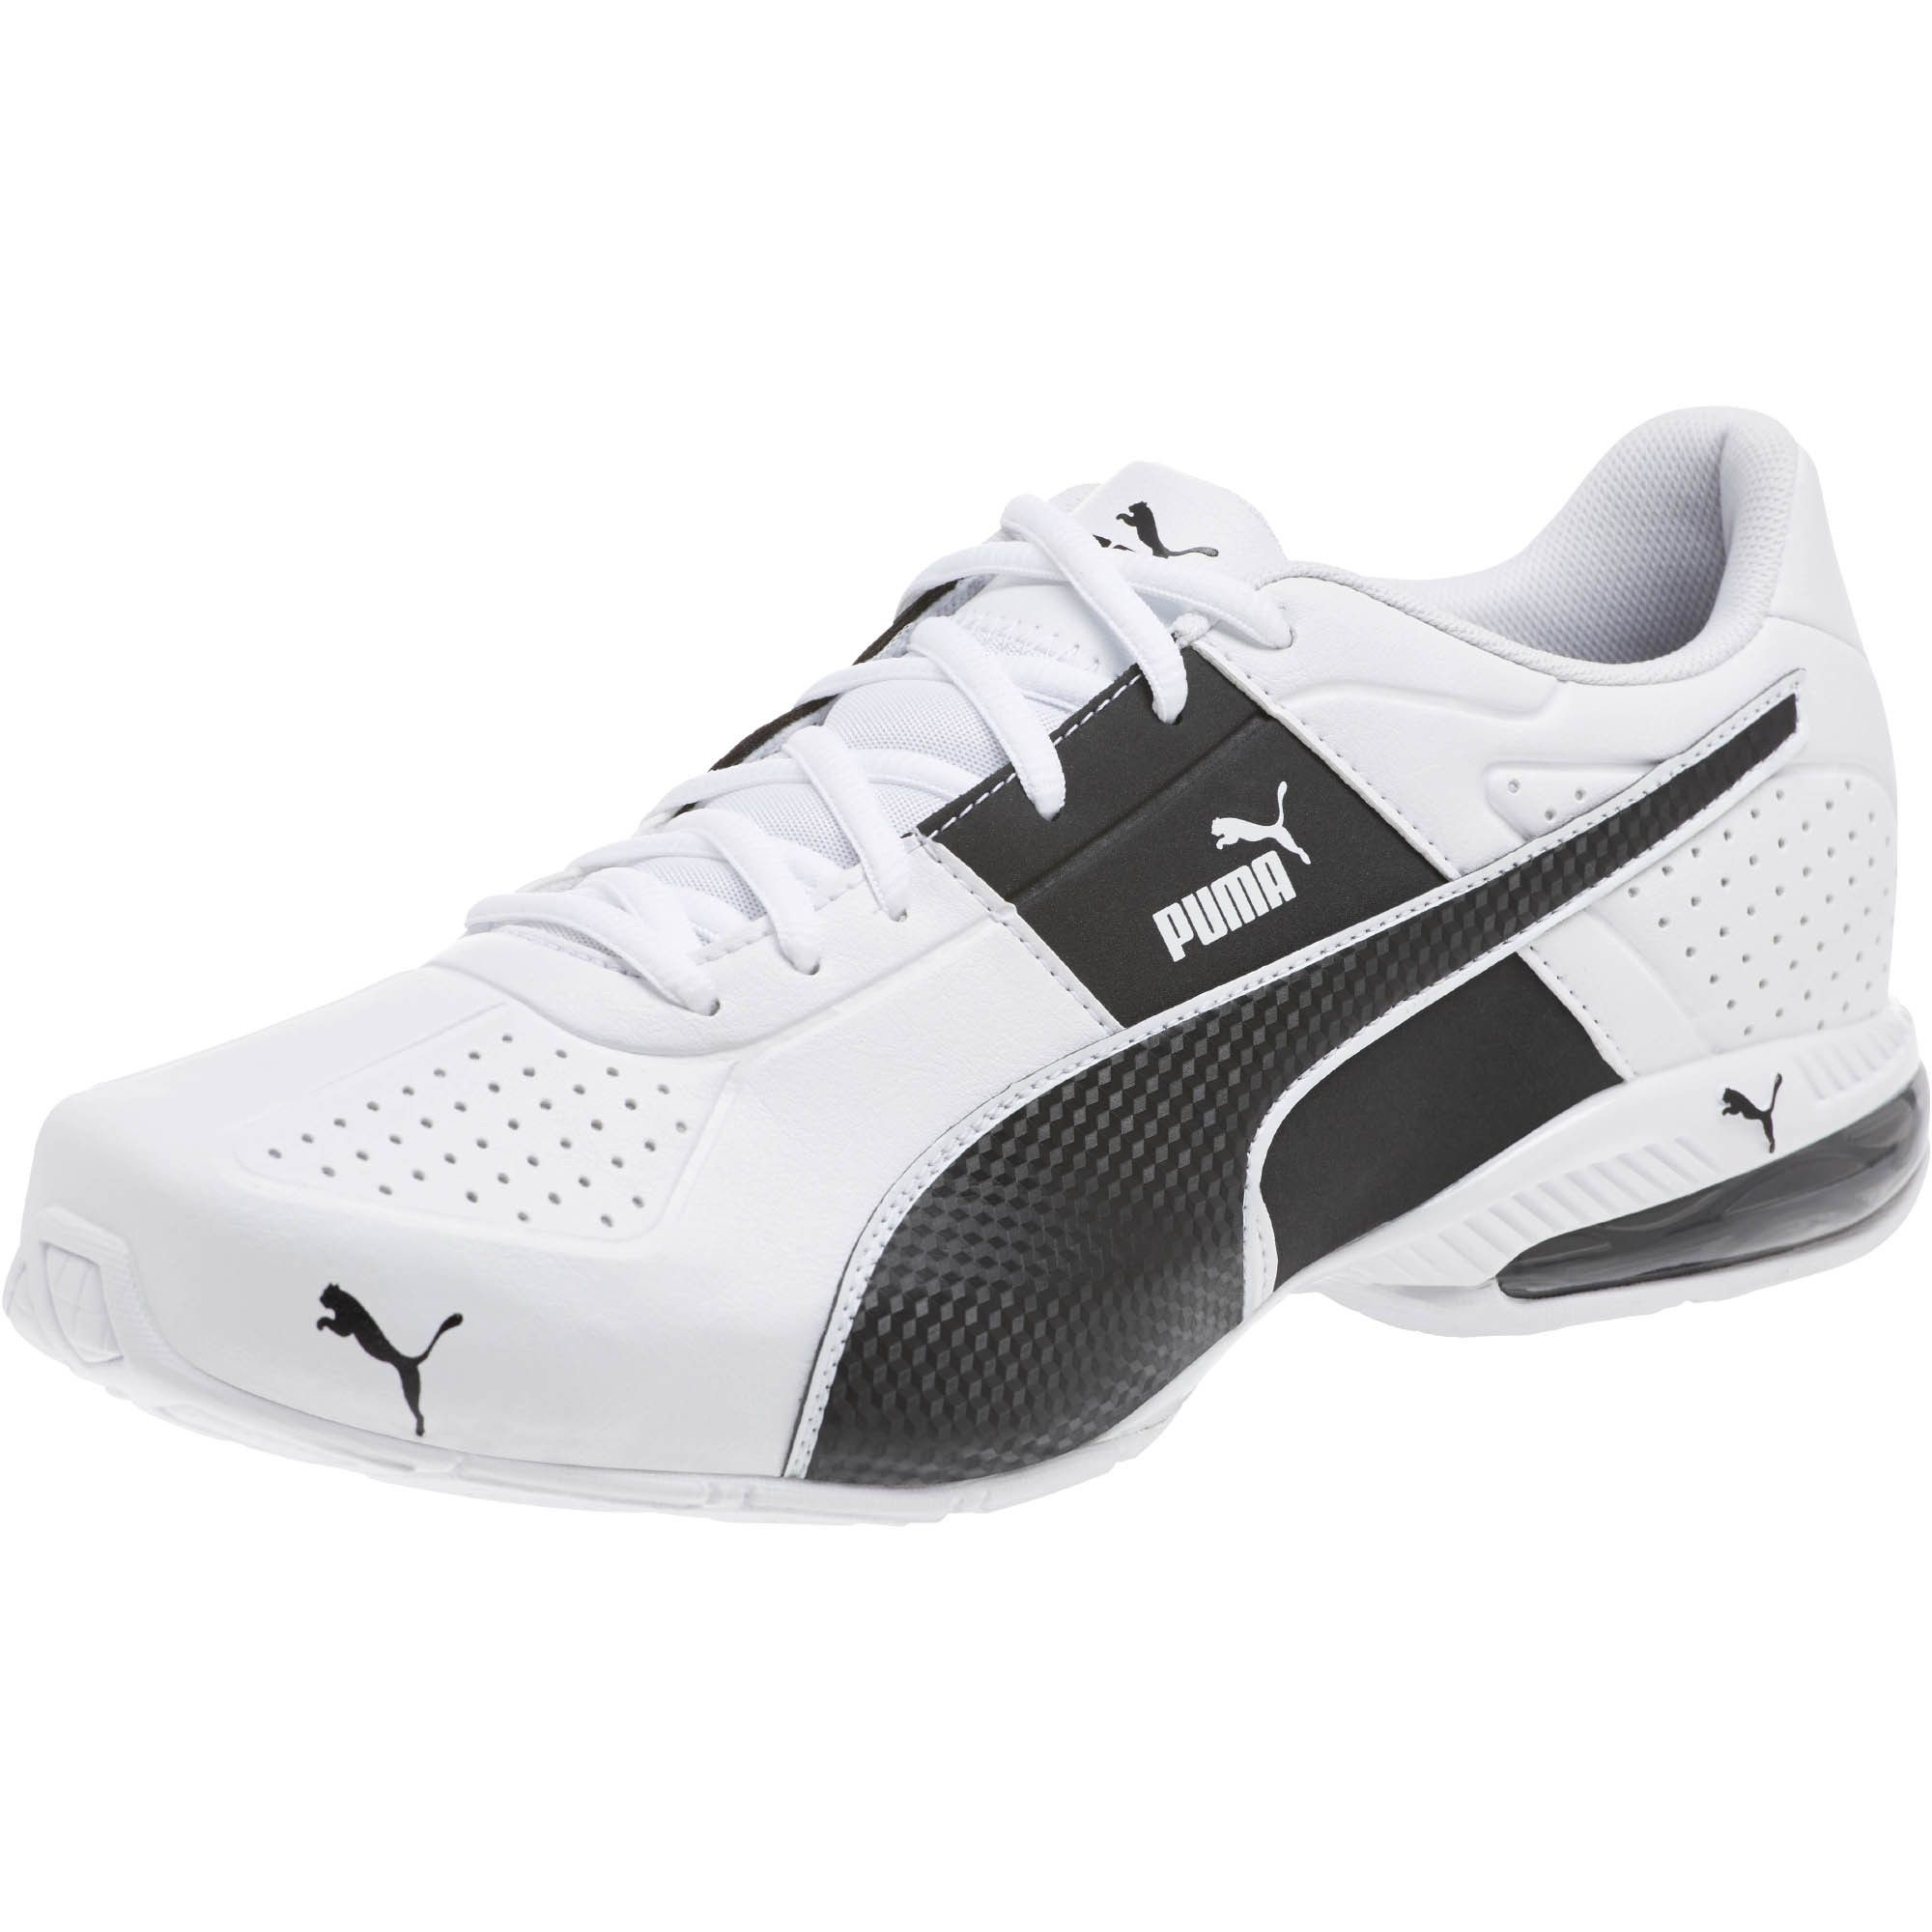 Picture 4 of 30 | Mens puma shoes, Dress shoes men, Casual ...